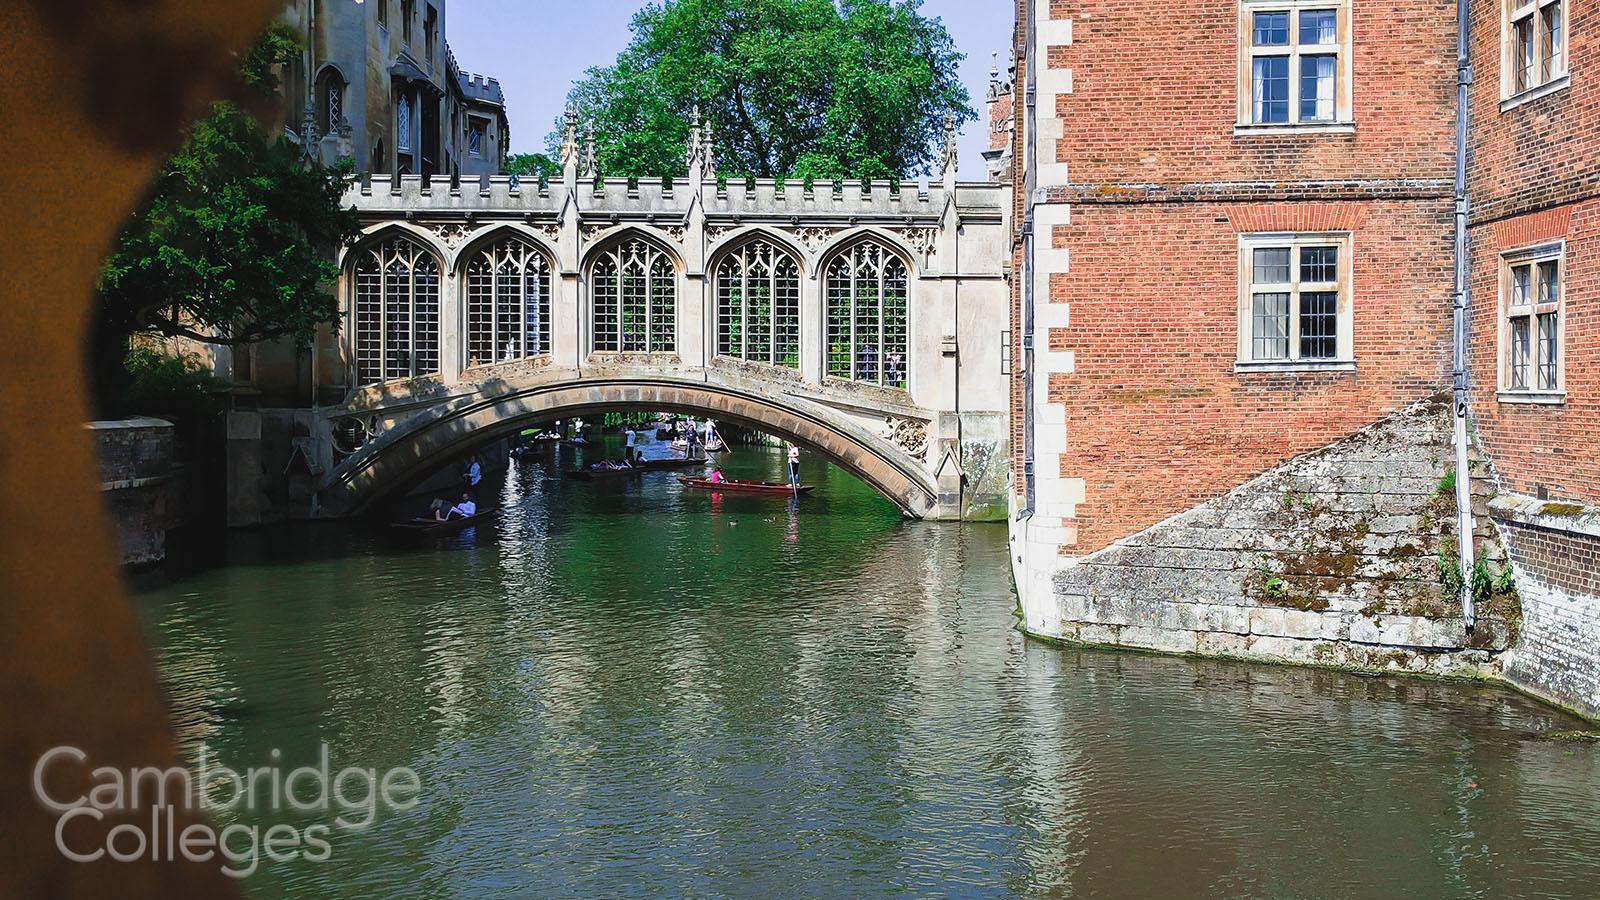 Bridge of sighs, St John's college, Cambridge